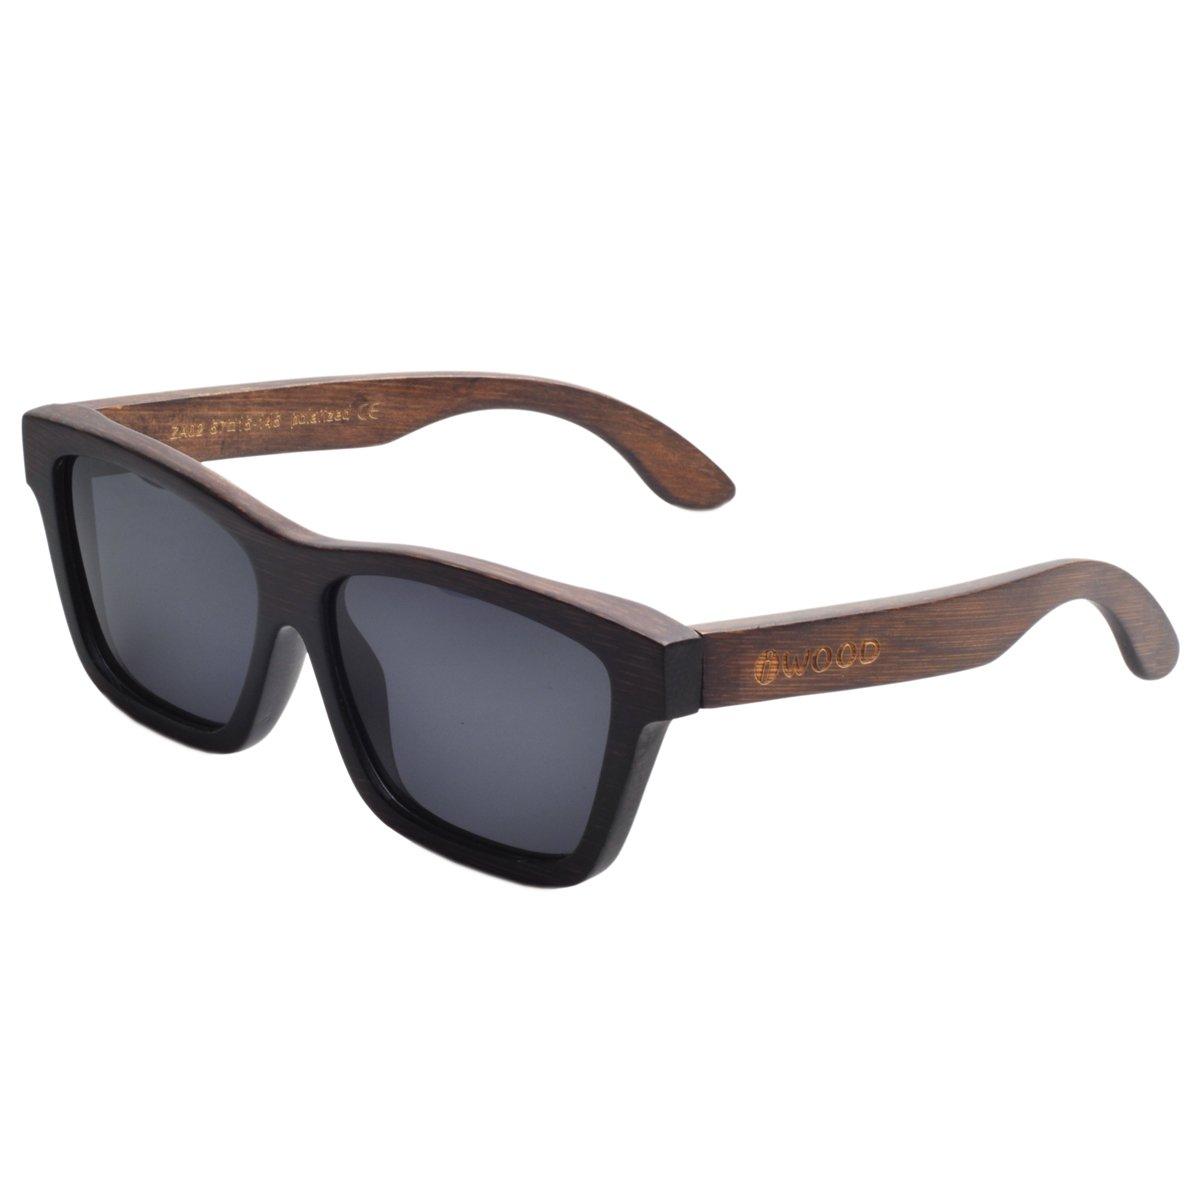 Iwood Marco de bambú Handcrafted Pintura Gris polarizado Gris lente Gafas de sol madera